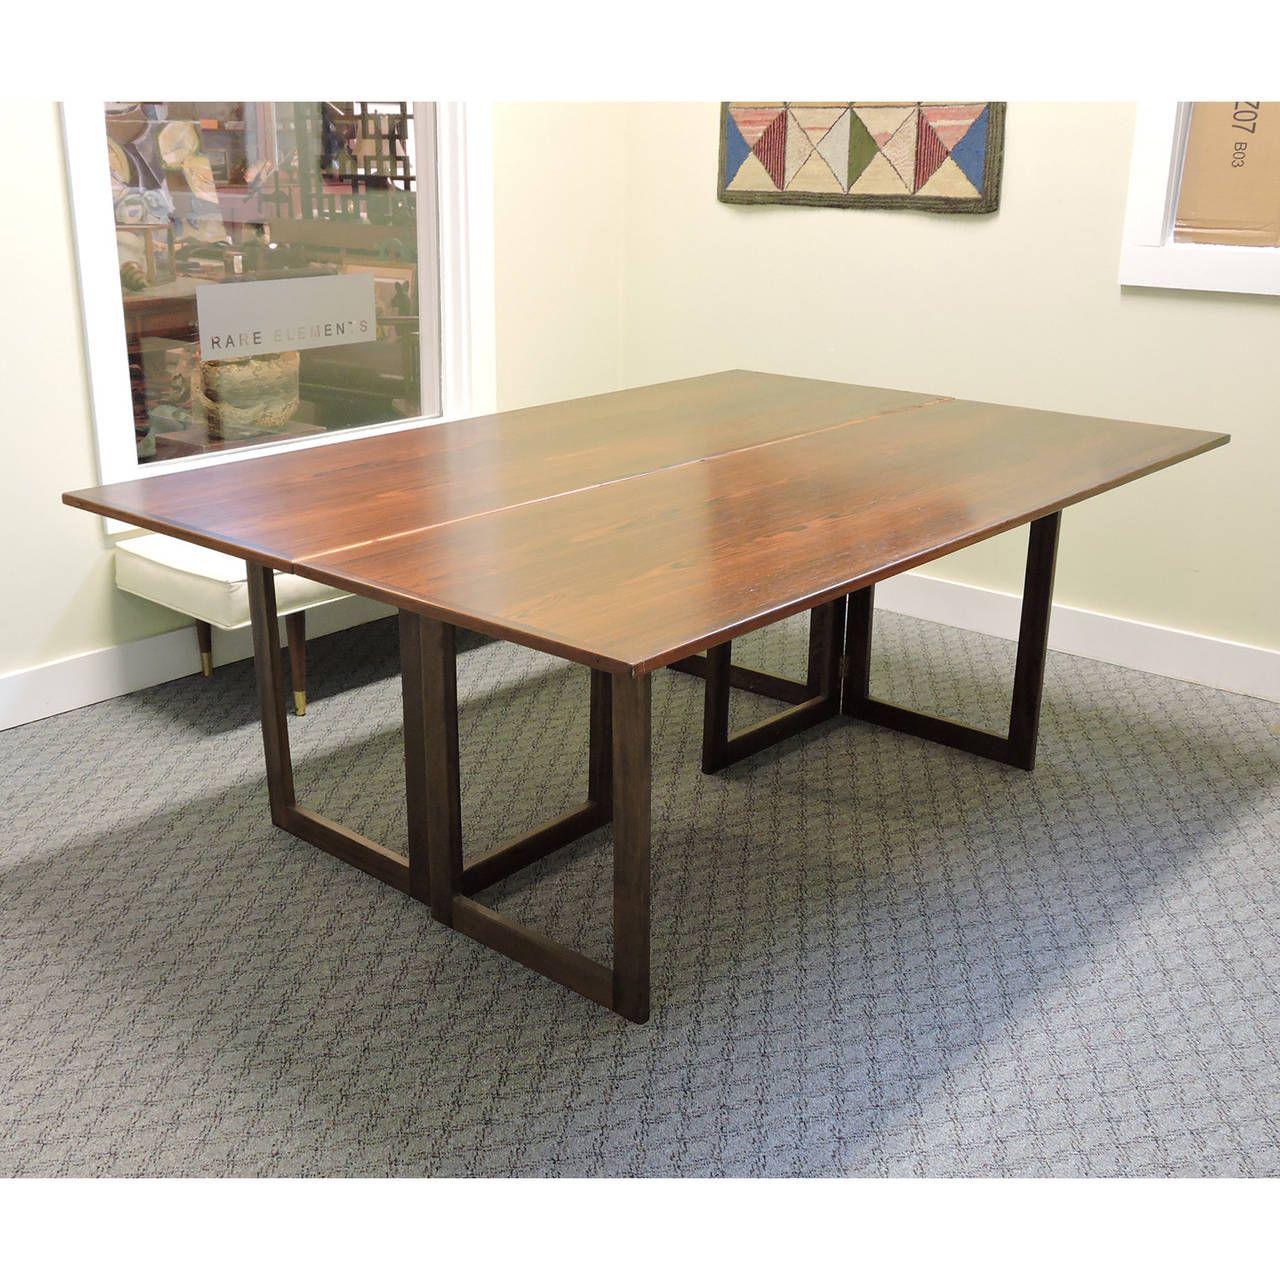 mid century modern kitchen table. Mid-Century Modern Skovmand \u0026 Andersen For Moreddi Rosewood Dining Table | From A Unique Mid Century Kitchen G